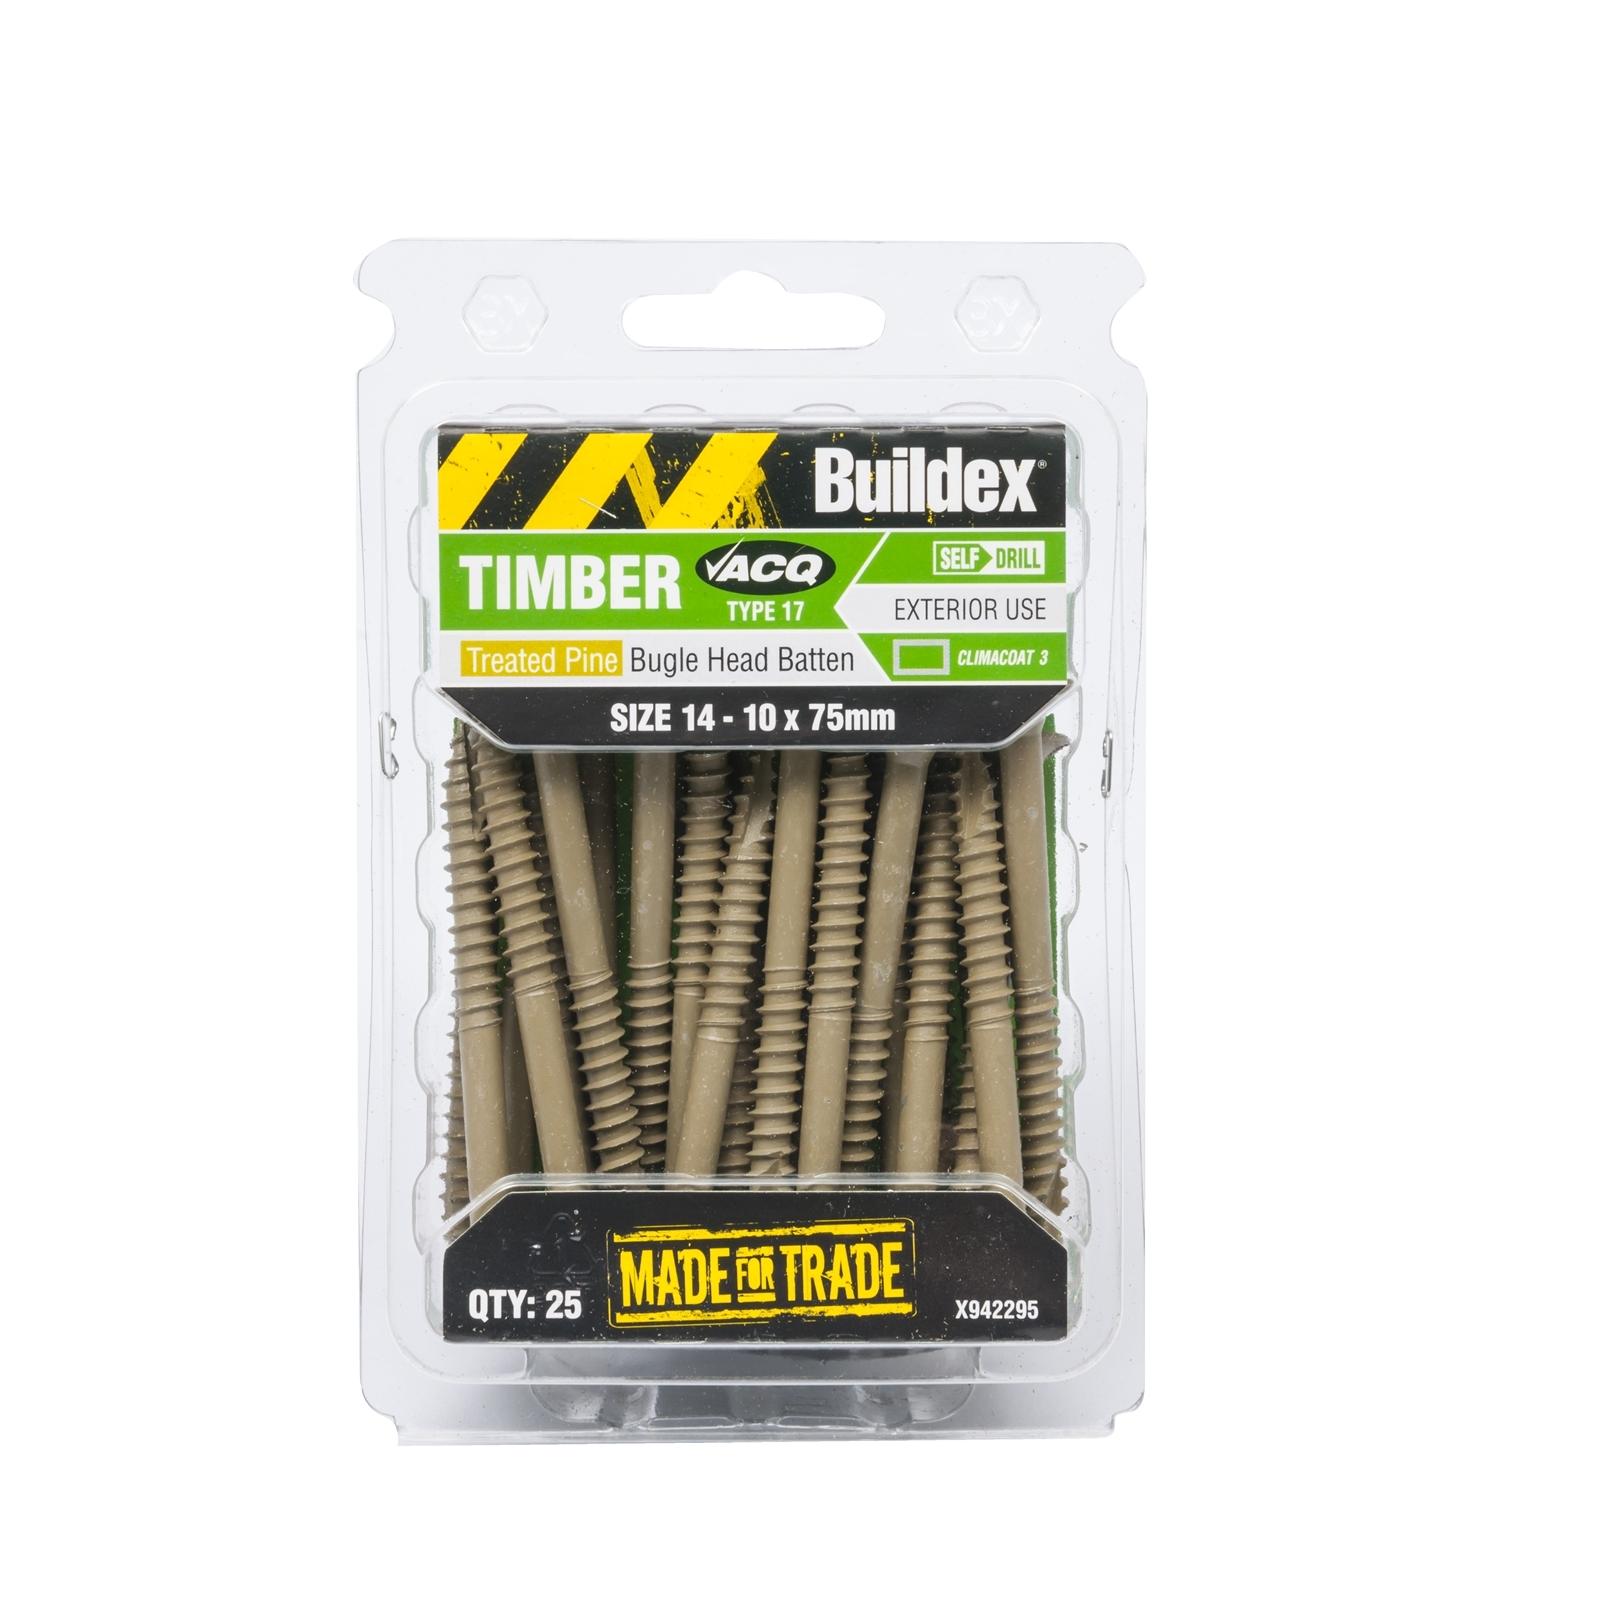 Buildex 14-10 x 75mm Climacoat Bugle Head Batten Timber Screws - 25 Pack